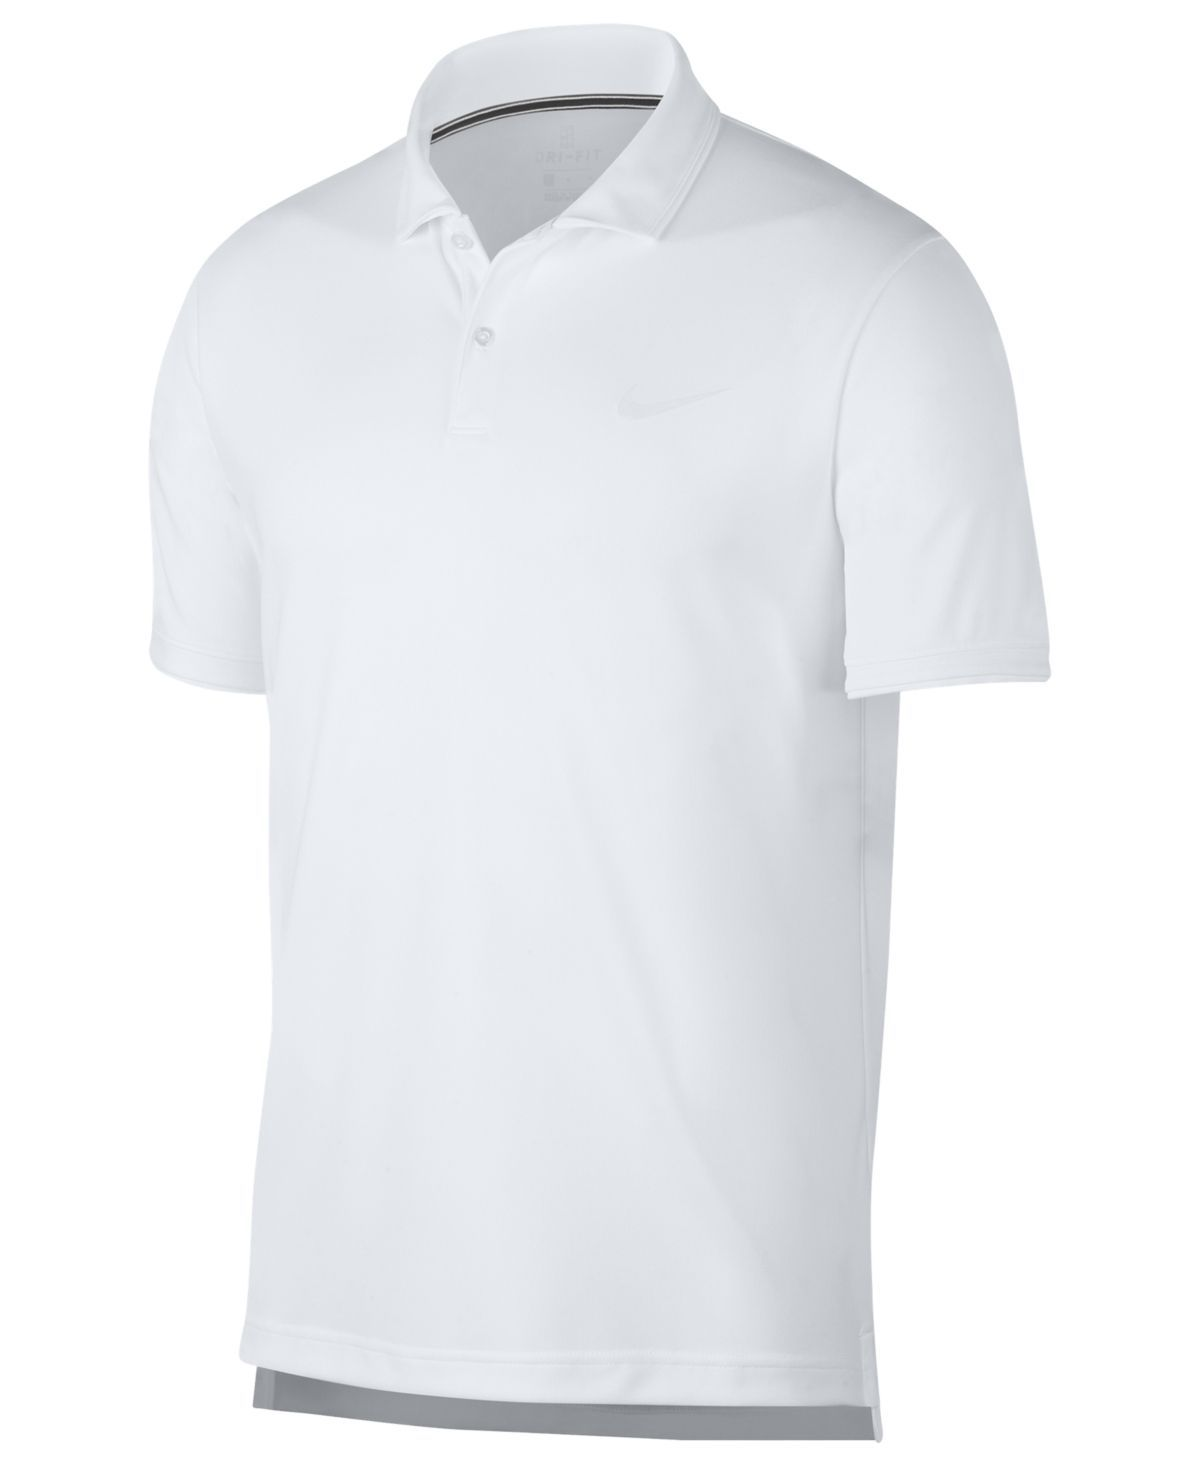 Nike Men's Court Dry Tennis Polo & Reviews - Polos - Men - Macy's -   - #court #cuteoutfits #cuteweddingdress #Dry #fashionjewelry #fashiontrends #Macys #MEN #Mens #Nike #pandoracharms #pandorarings #Polo #Polos #Reviews #Tennis #trendyoutfits #weddingbride